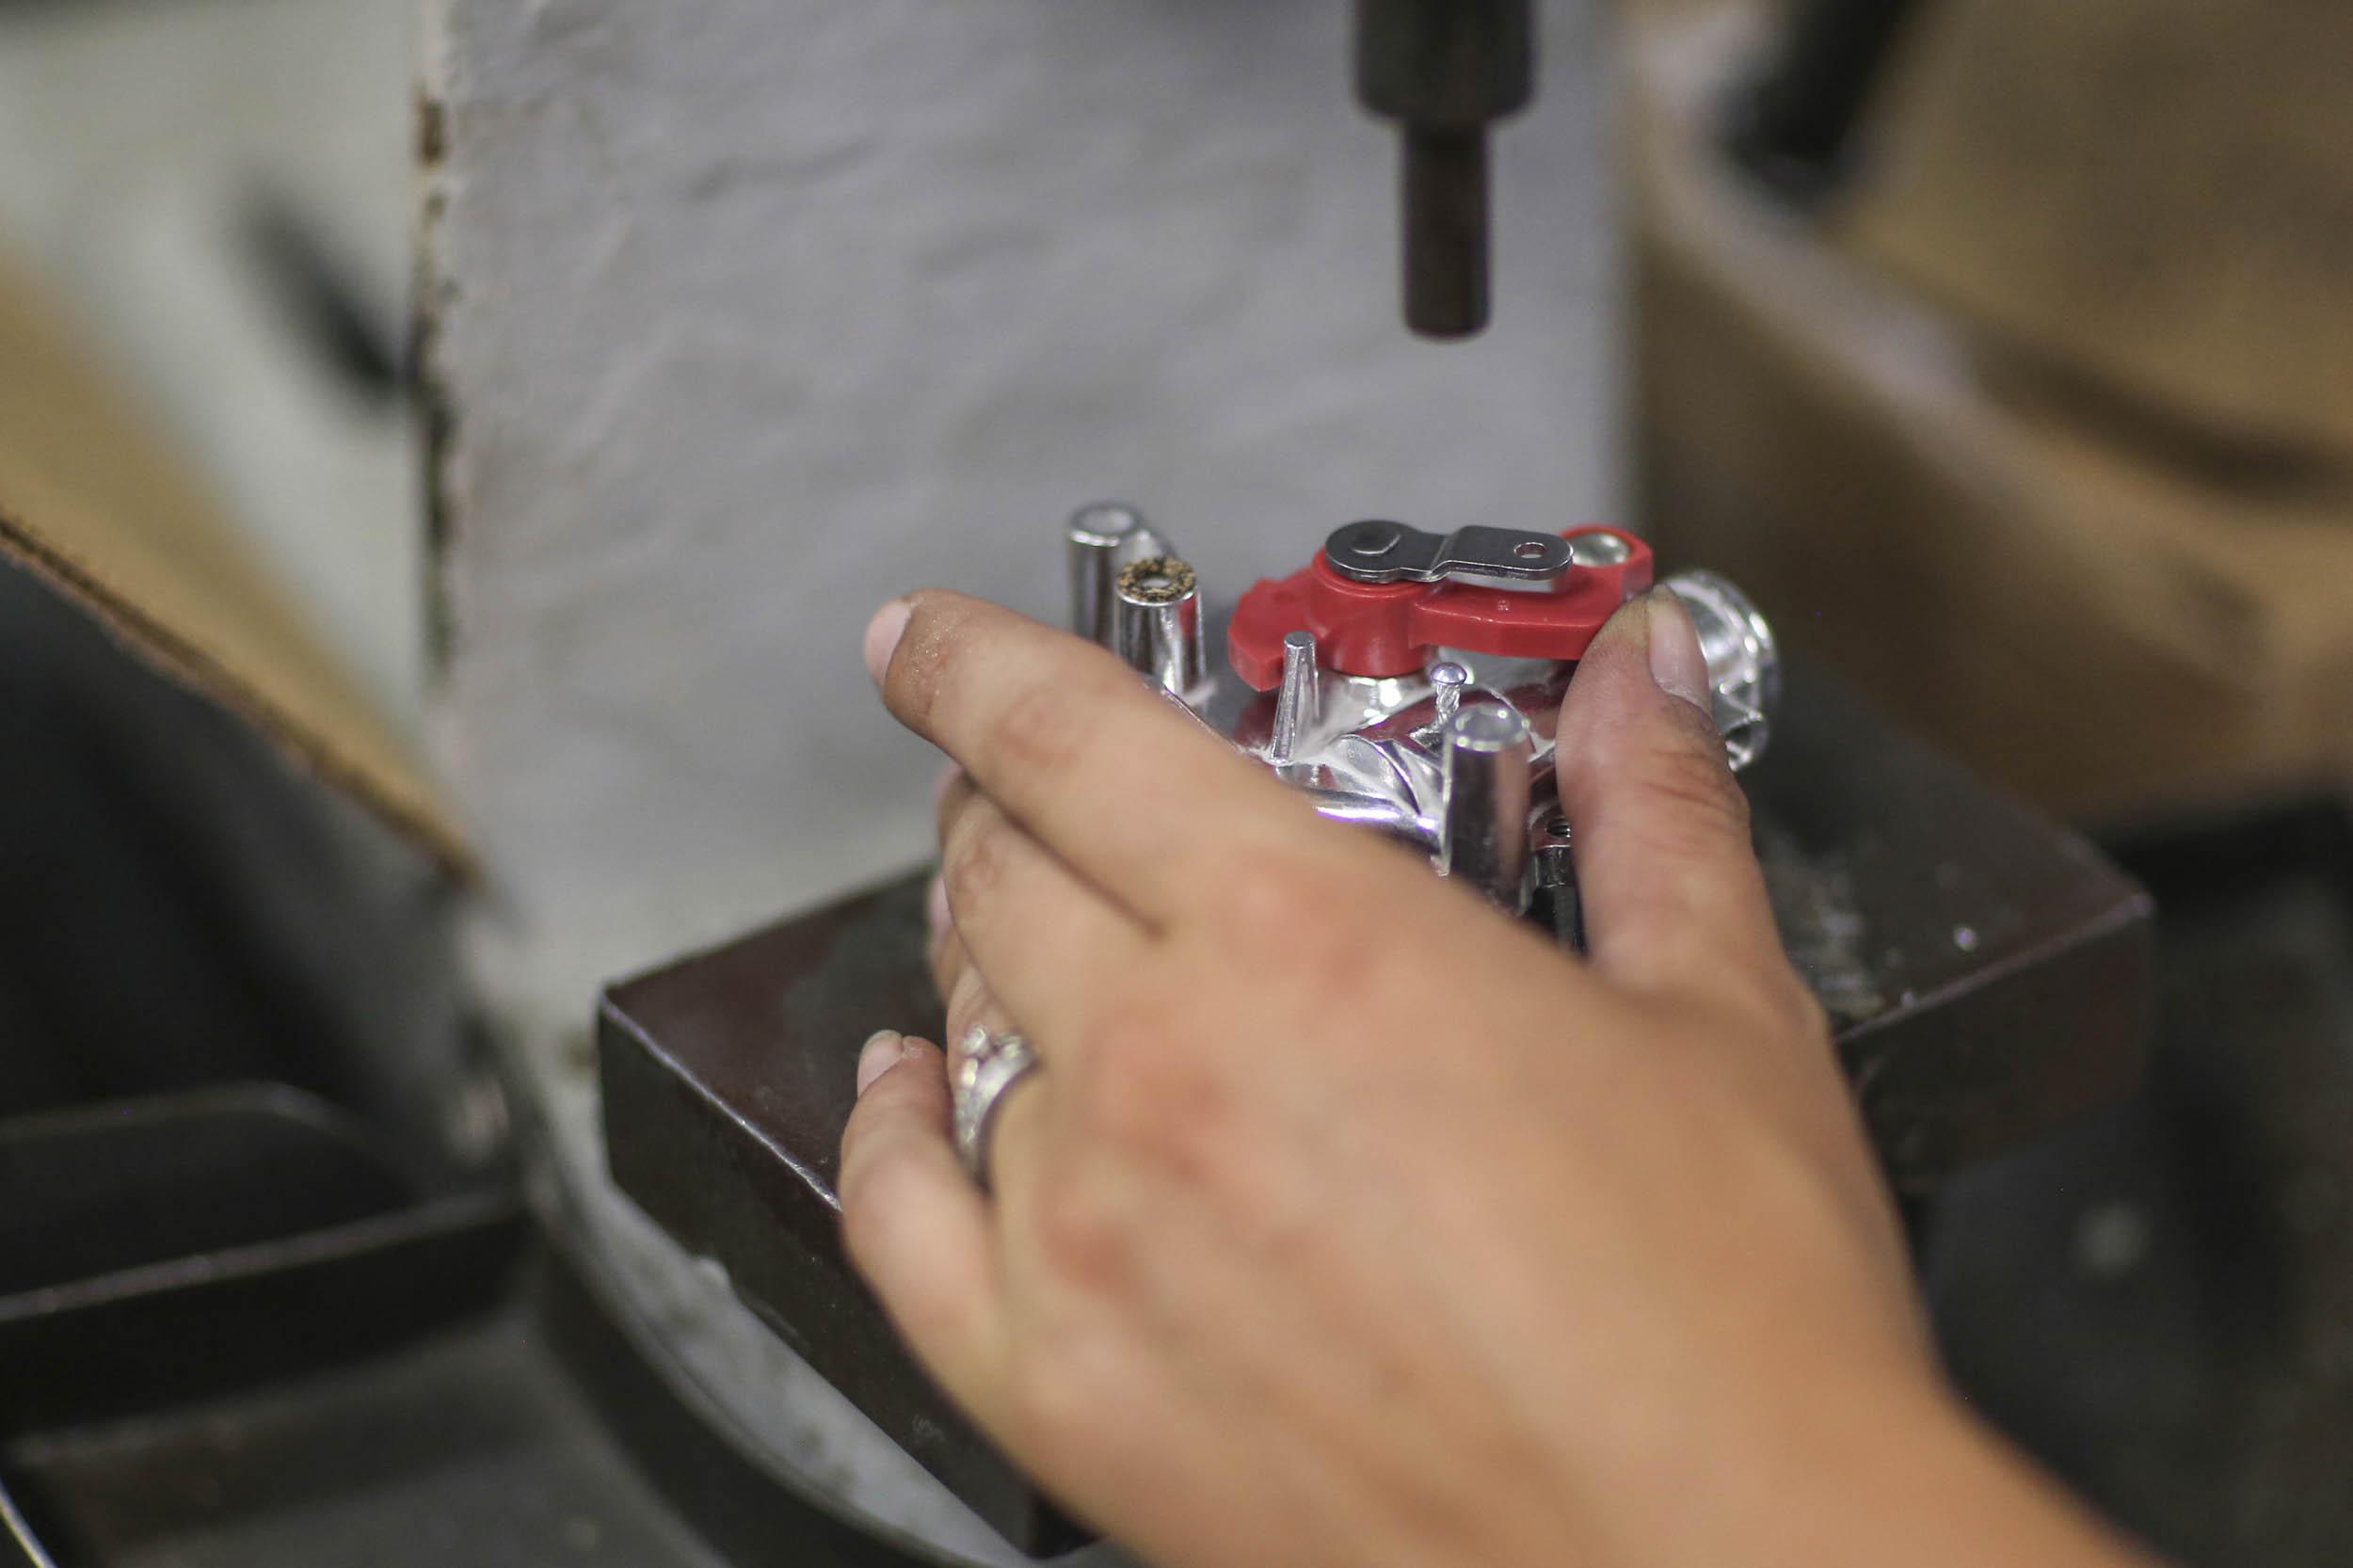 Holley four-barrel carburetor shaft pressed into place